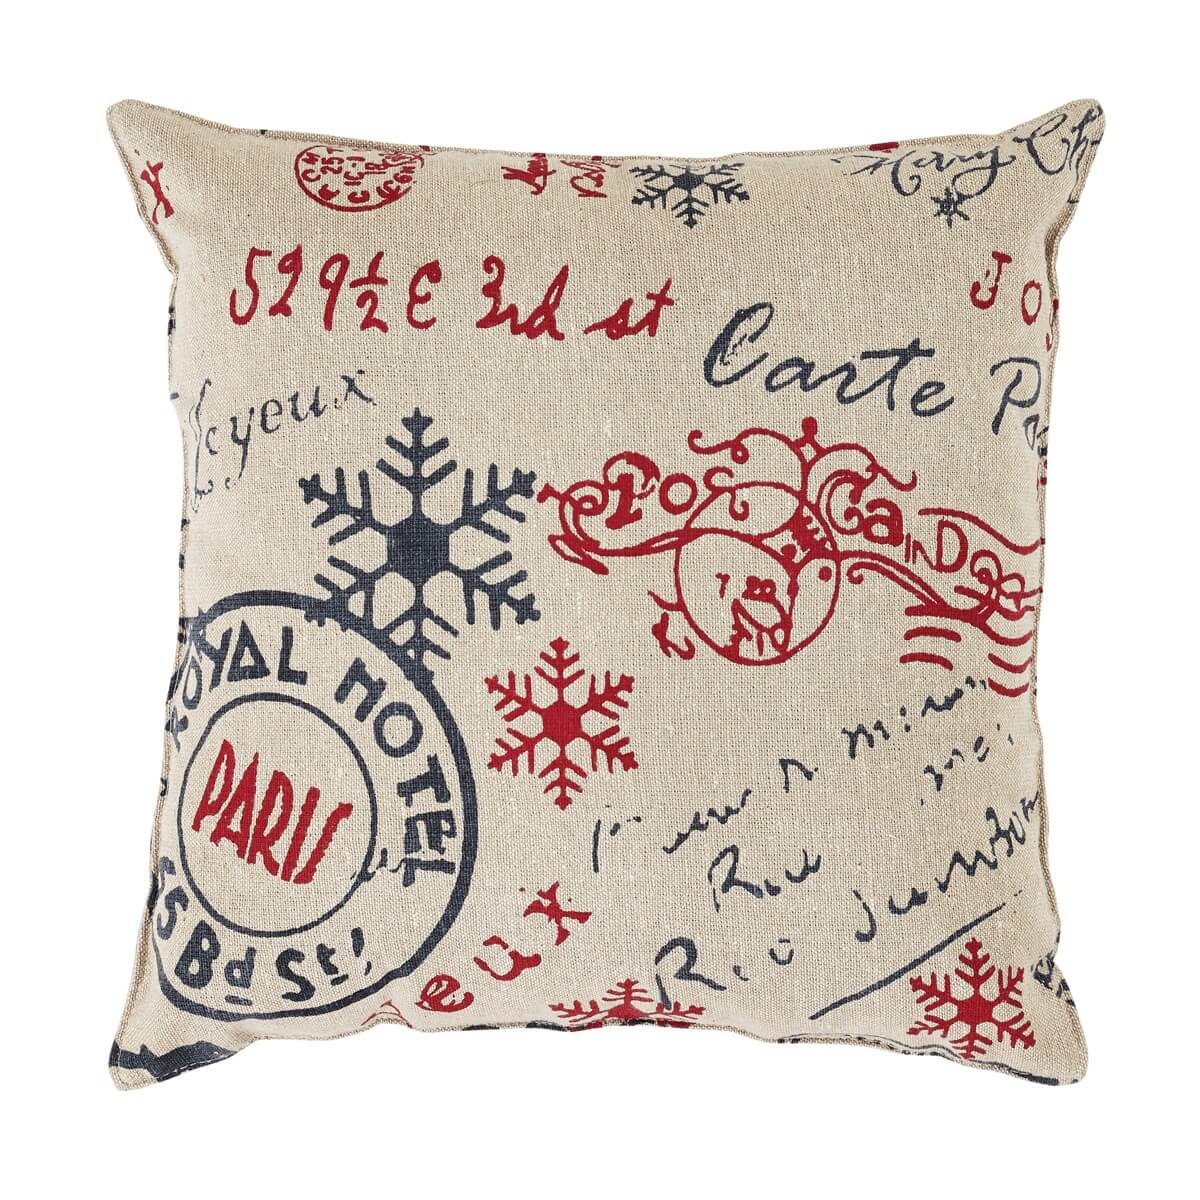 Joyeux Noel Throw Pillow Teton Timberline Trading French Country Creations